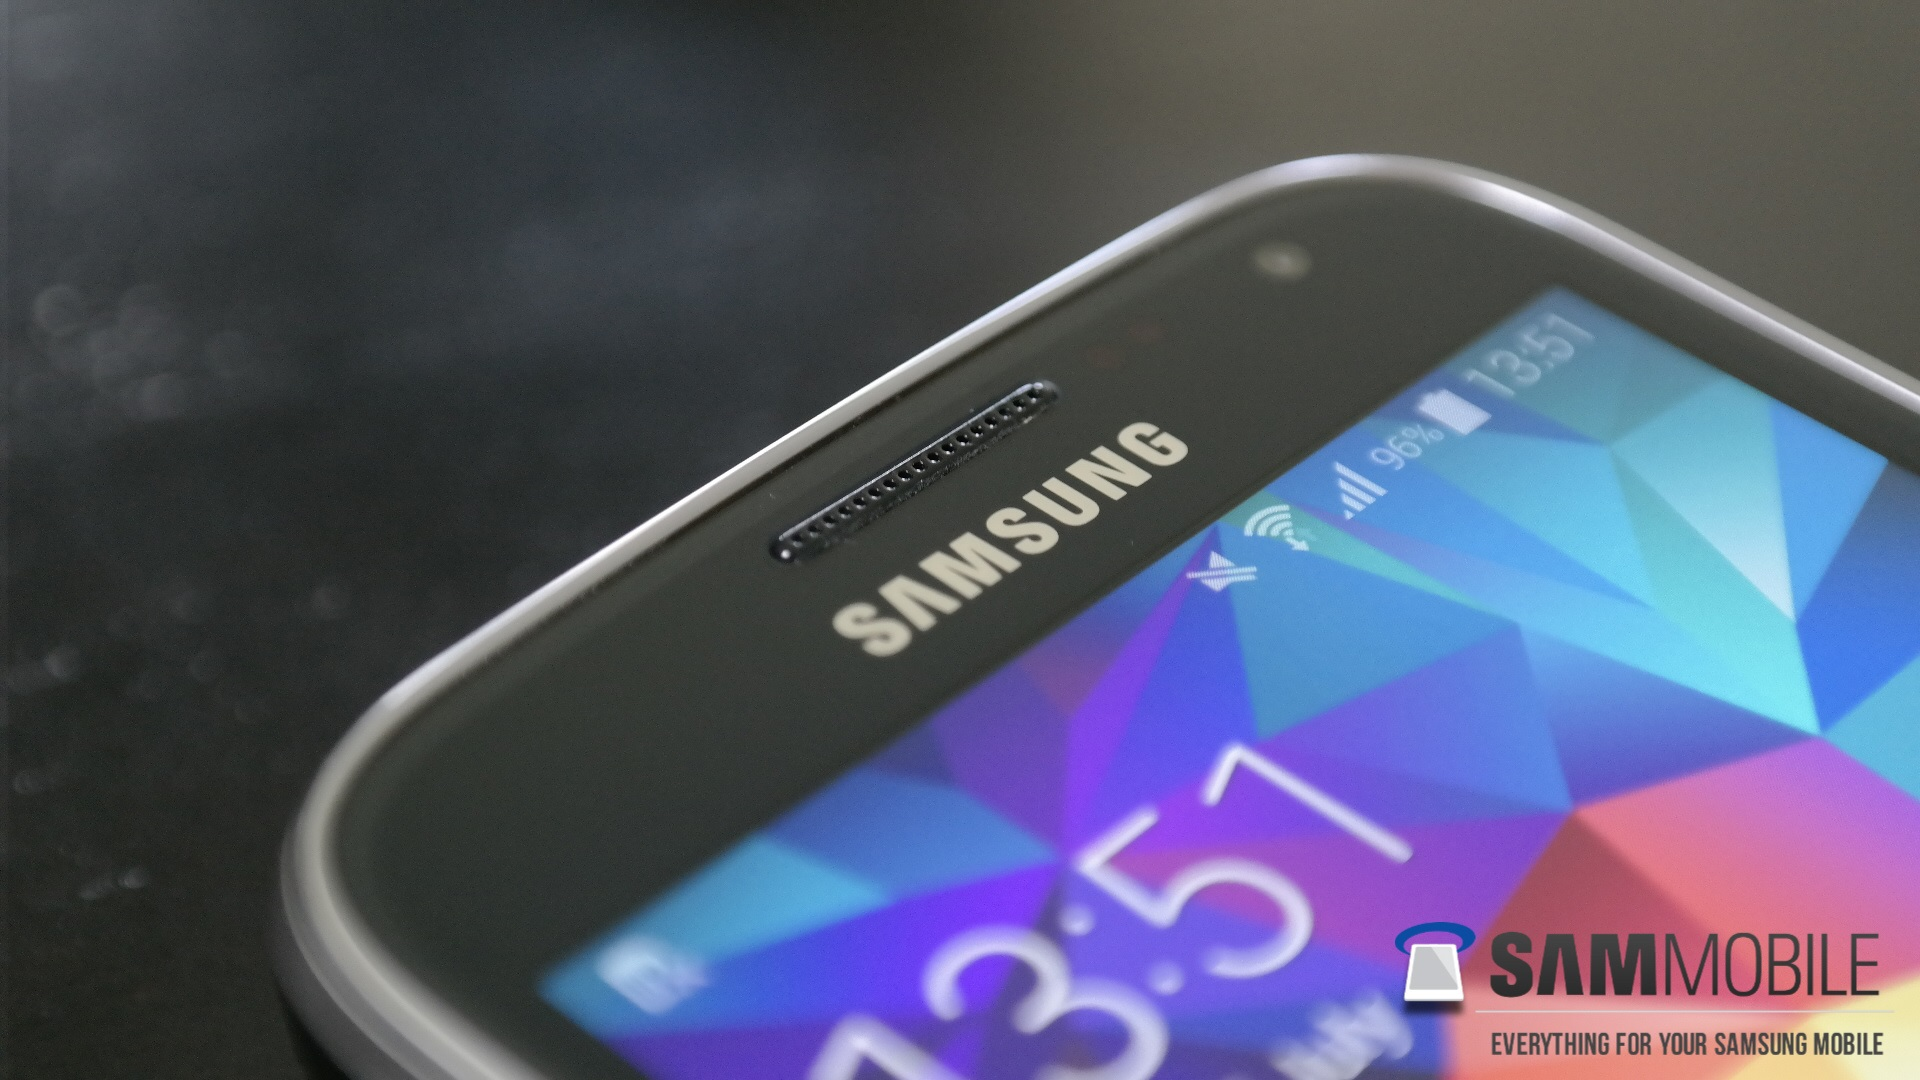 Review Samsung Galaxy K Zoom Sammobile 8gb White Display